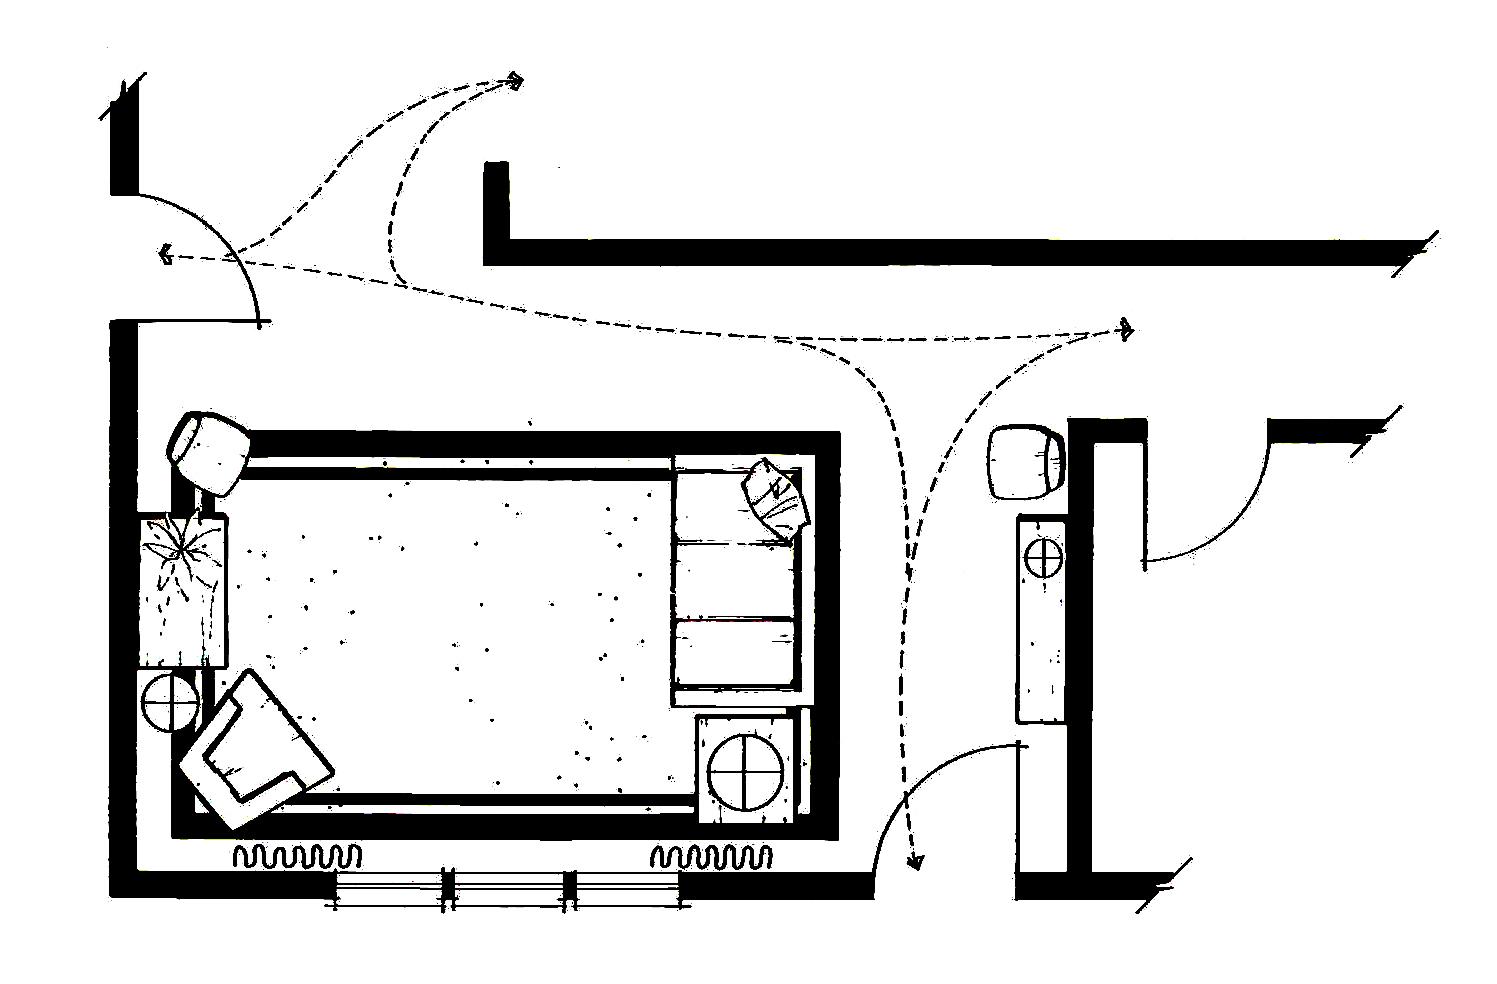 Interior Design Furniture Placement Guidelines ~ Vwartclub furniture arrangement function i